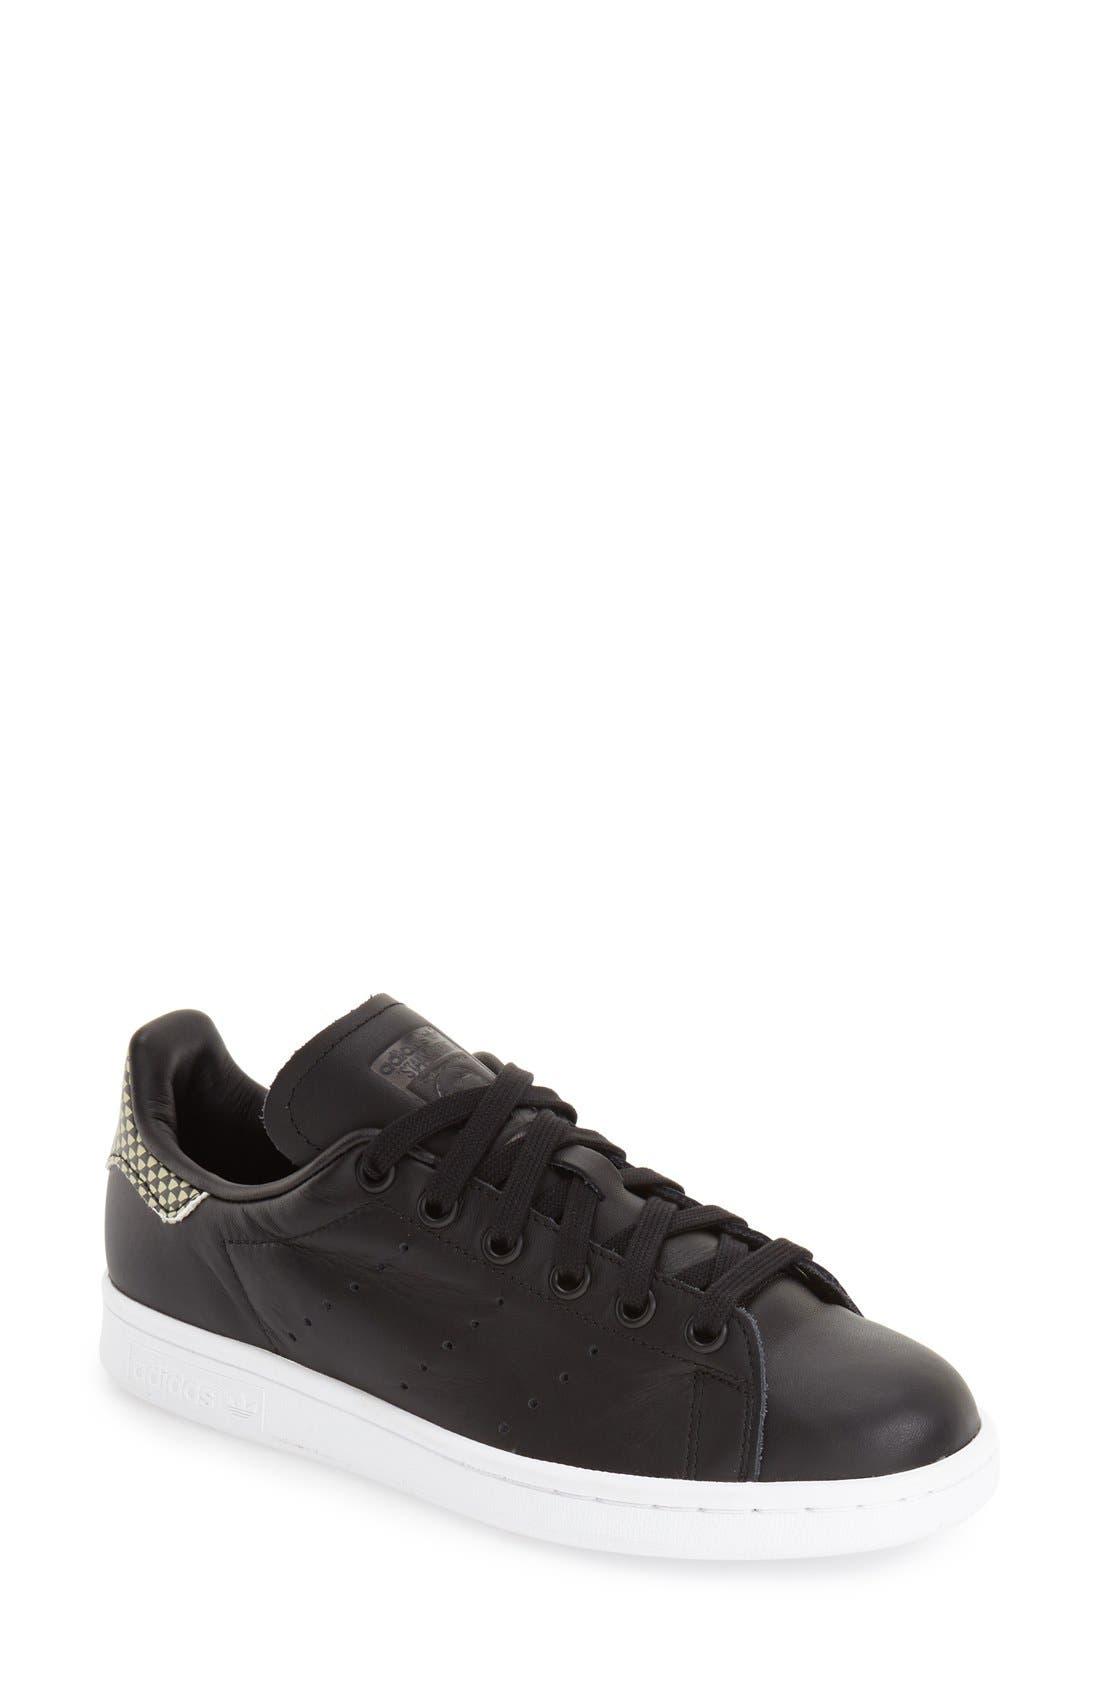 Main Image - adidas 'Stan Smith' Sneaker (Women)